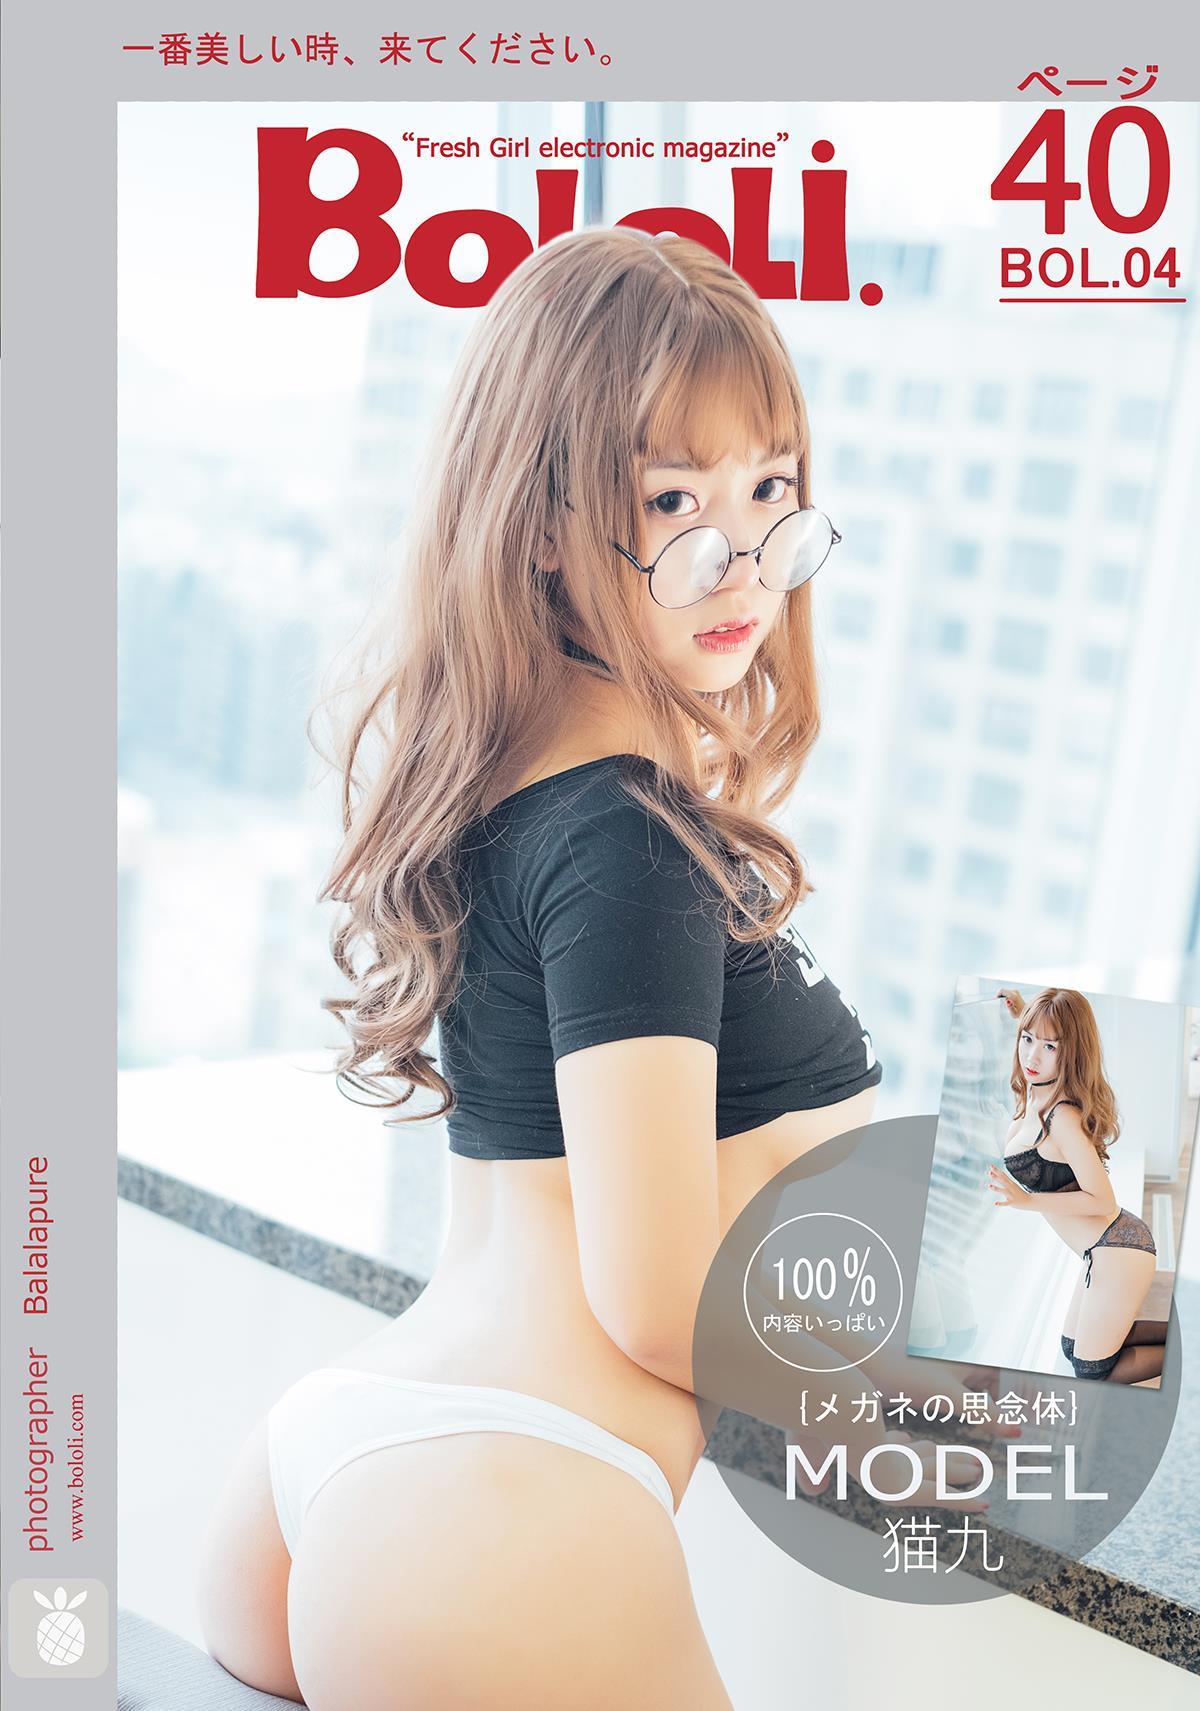 [BoLoli波萝社]BOL004 猫九酱Sakura 猫九 童颜巨乳小萝莉 性感蕾丝内衣私房写真集